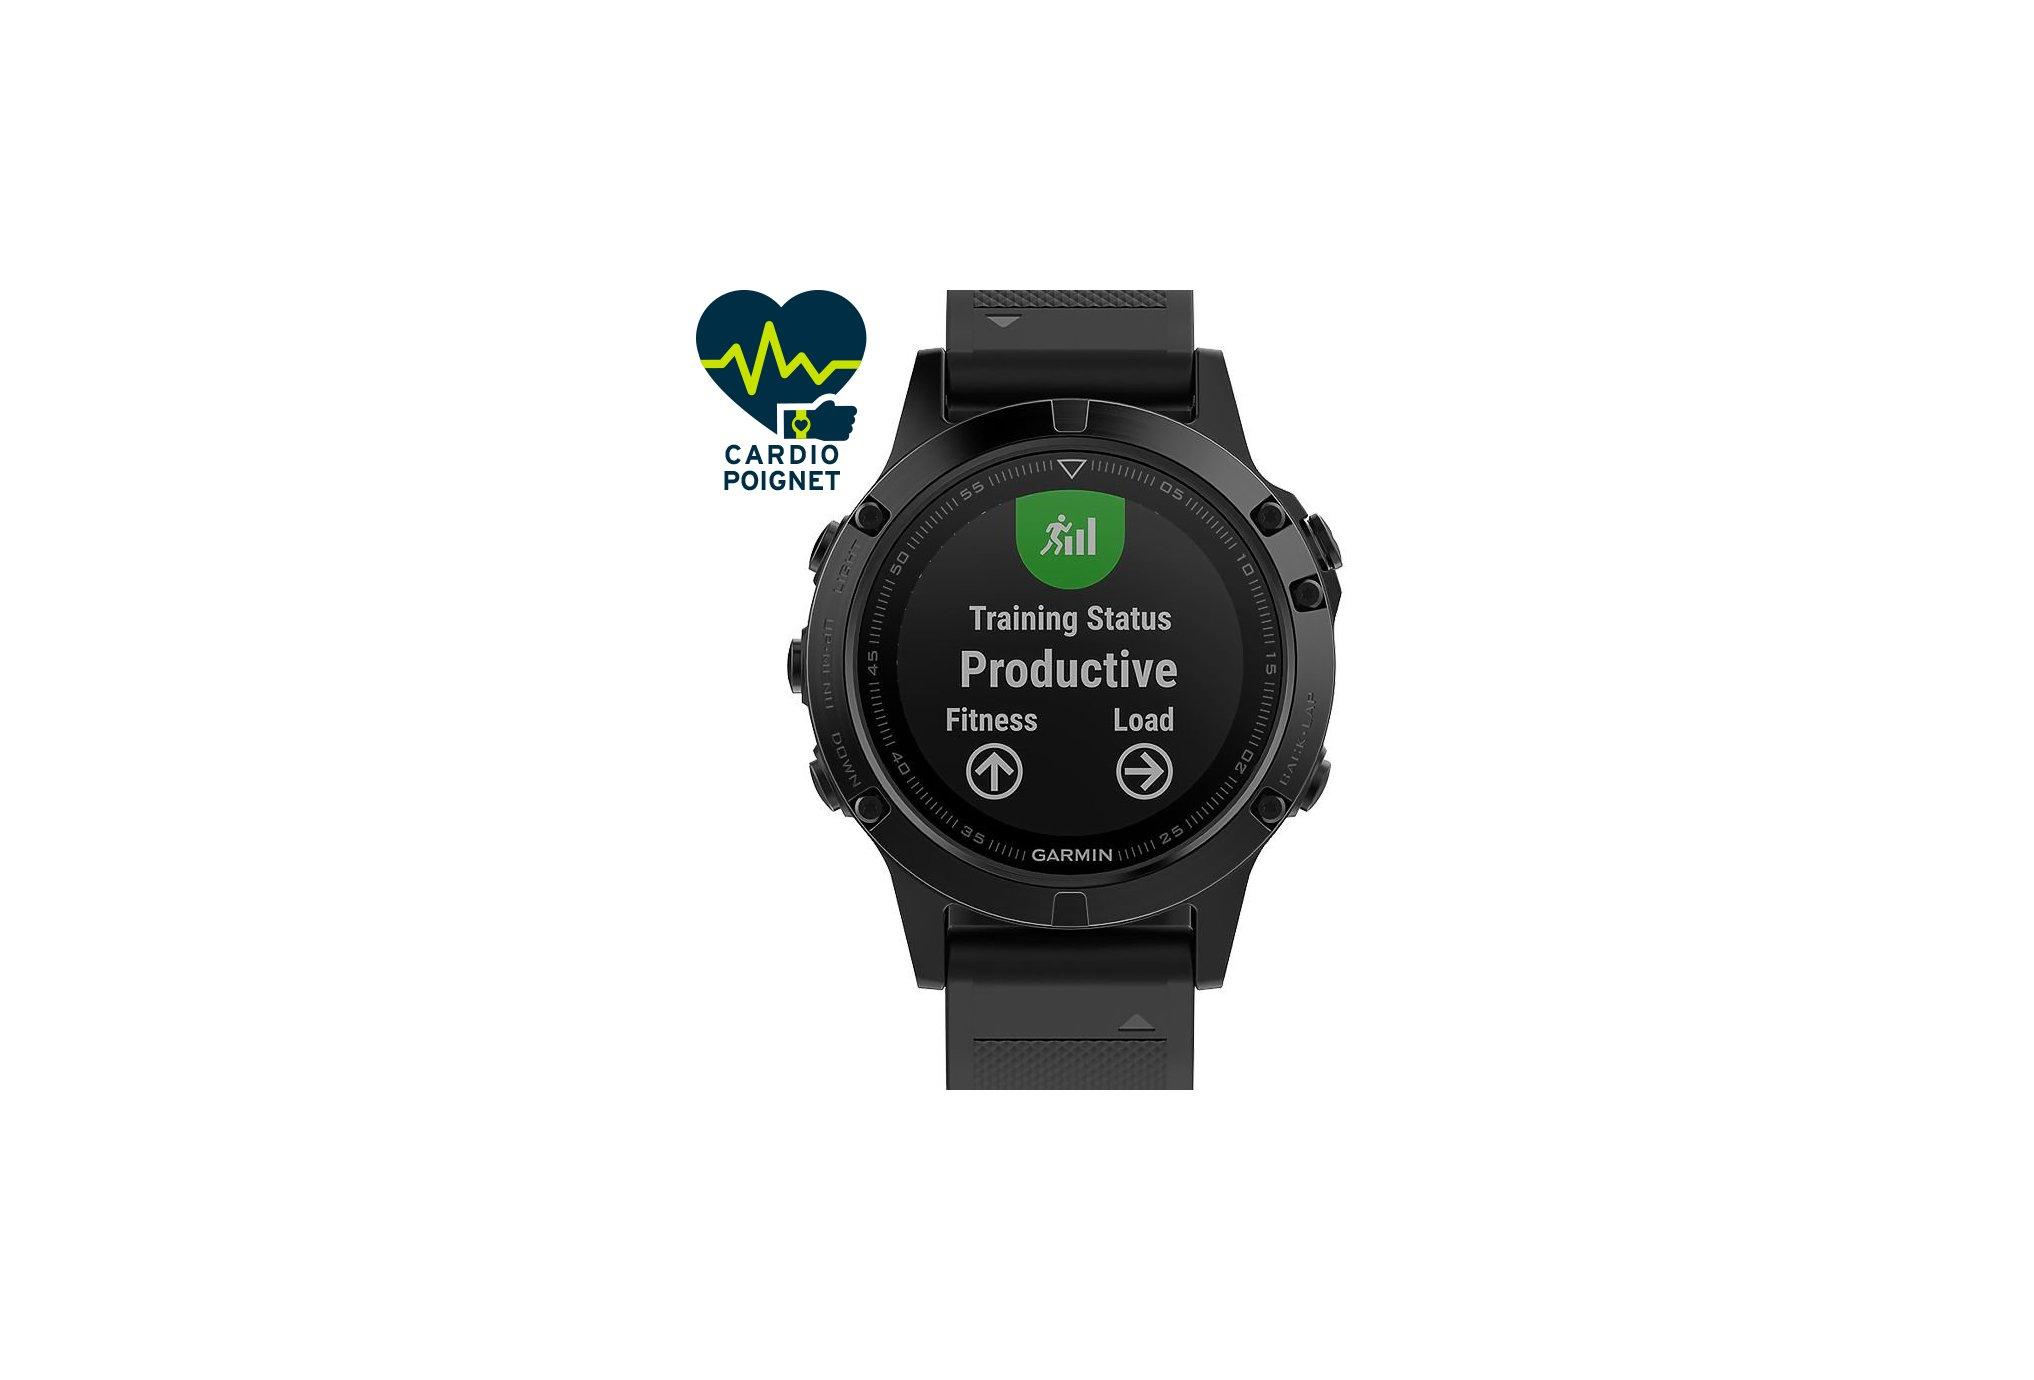 Garmin Reloj Fénix 5 Sapphire GPS Multisports Cardio-Gps